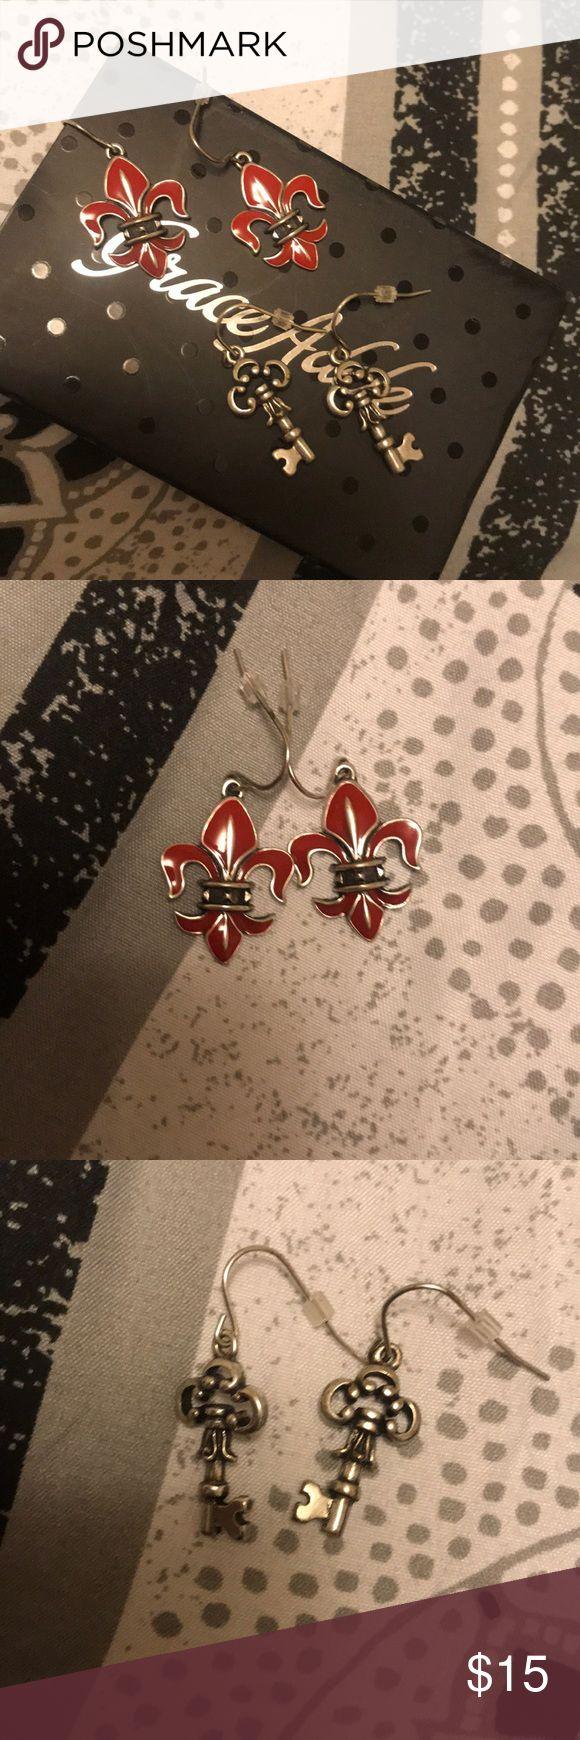 2 sets of grace Adele earrings new with box! Super cute earrings 2 sets! New with box grace adele Jewelry Earrings